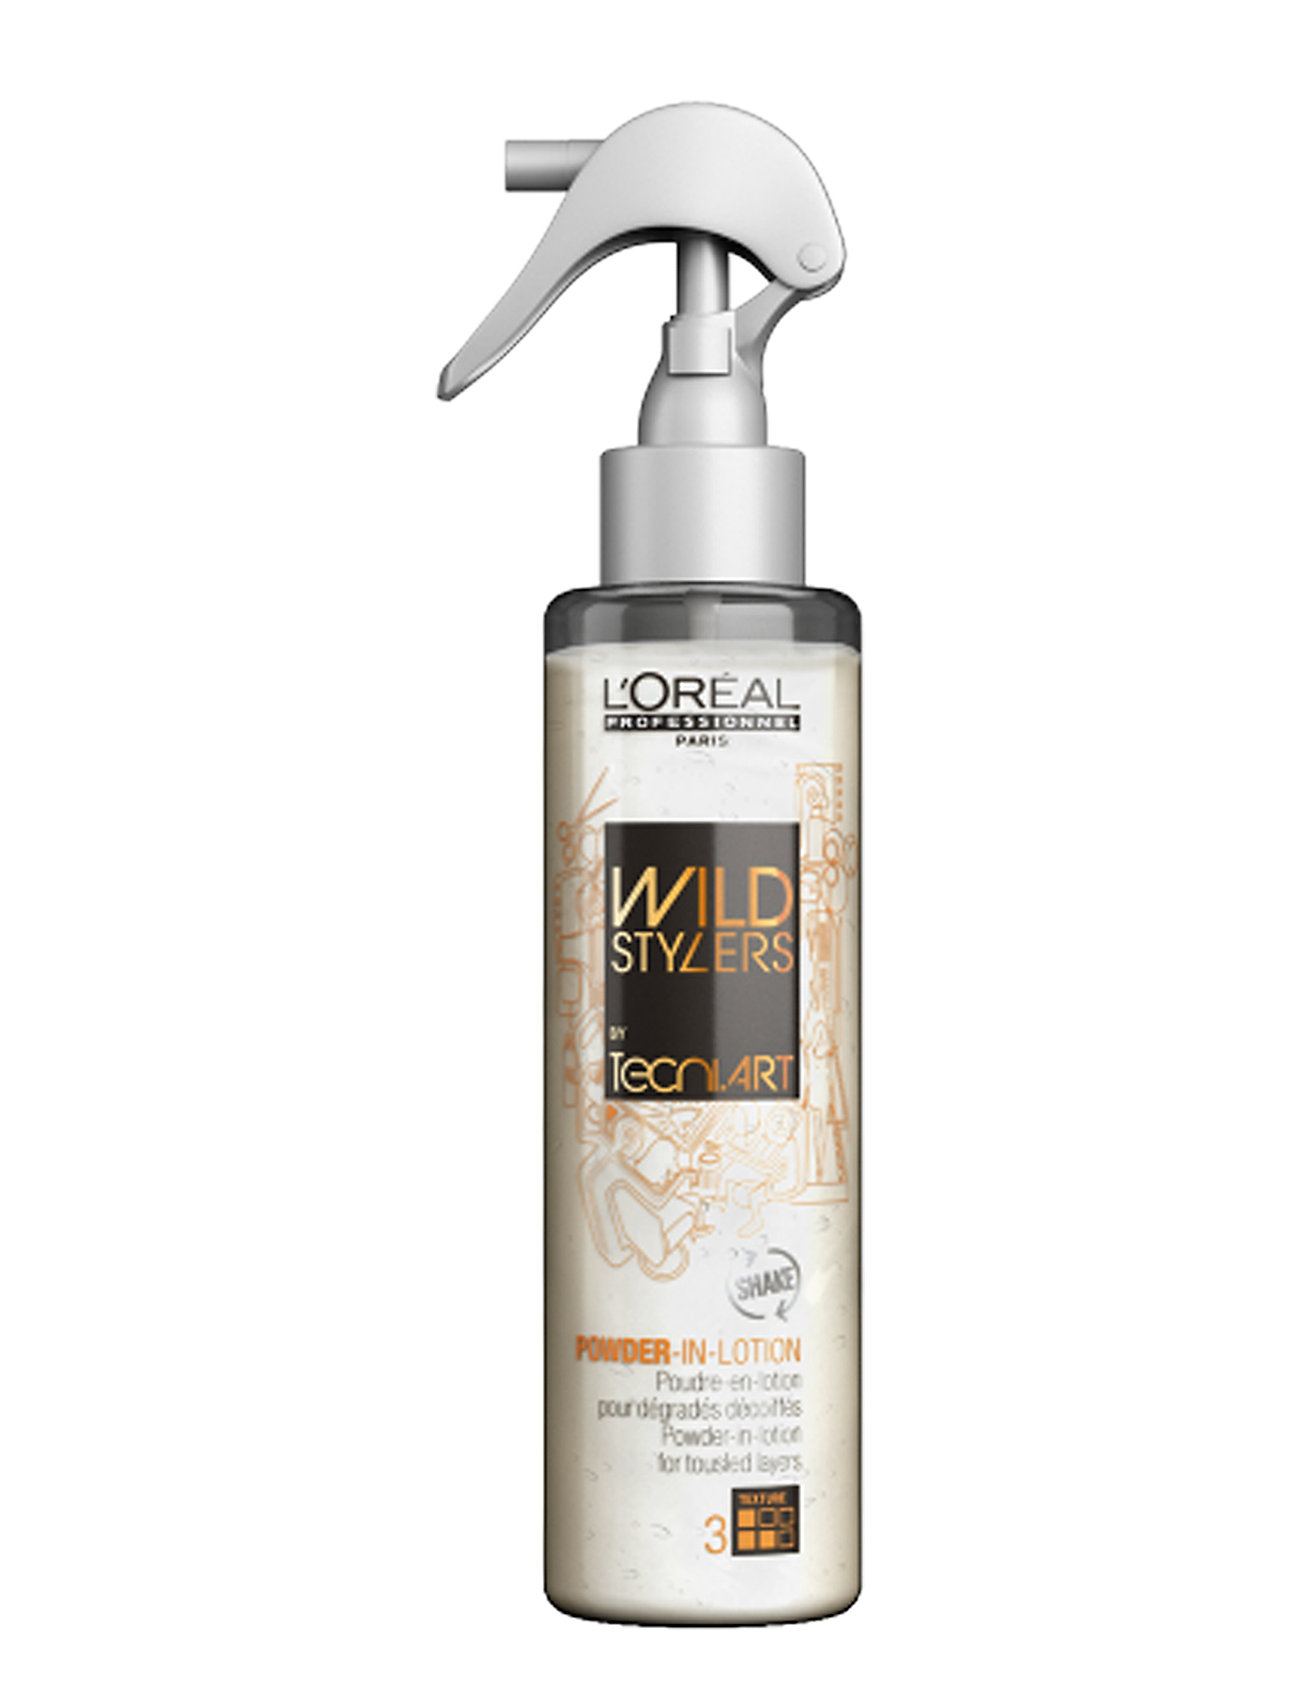 L'OréAl Professionnel Wild Stylers Powder In Lotion - L'Oréal Professionnel